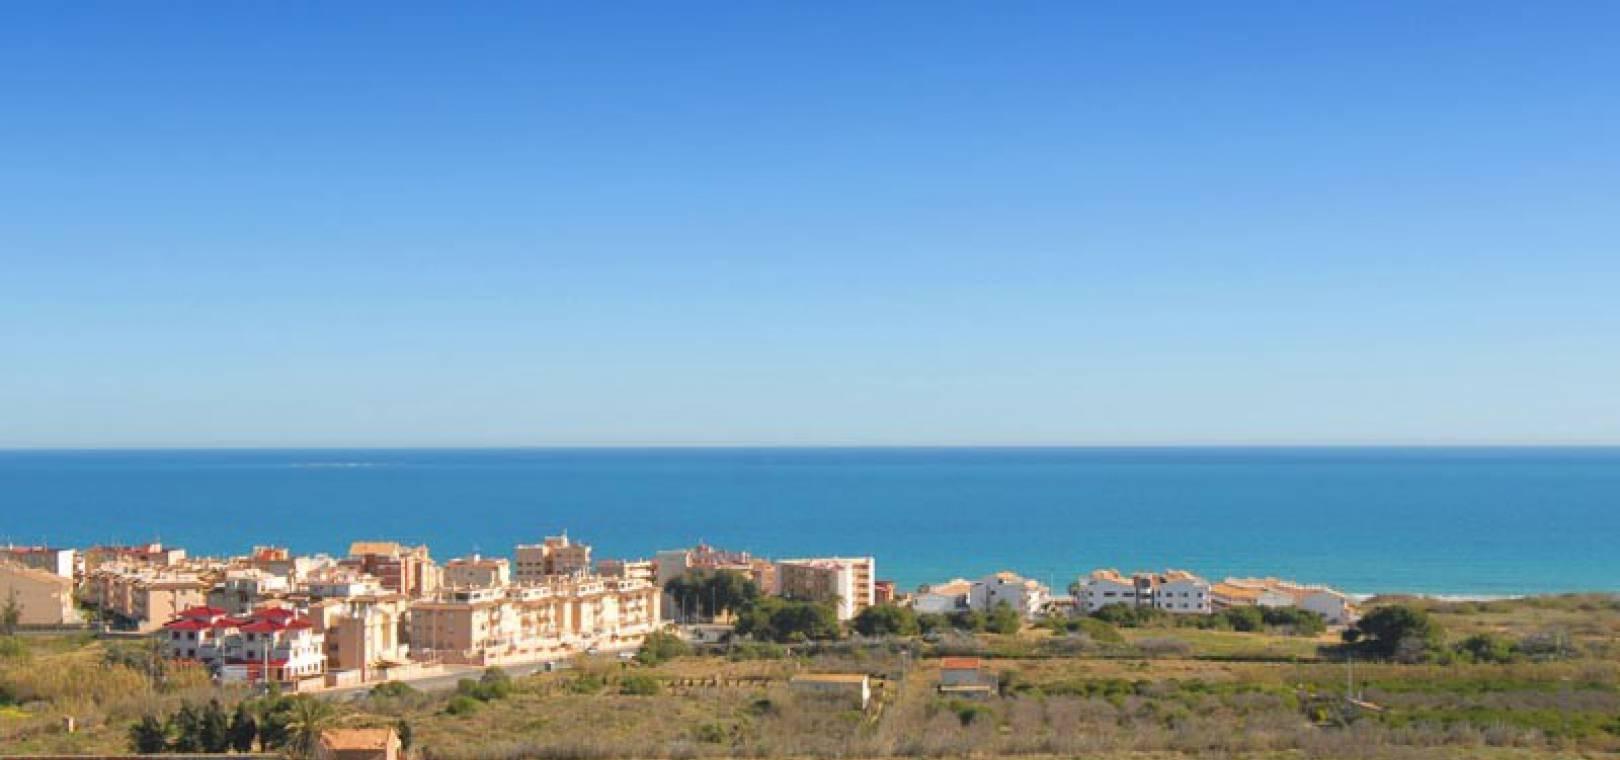 to buy,villas,modern,guardamar hills,guardamar,costa,blanca,op16-view